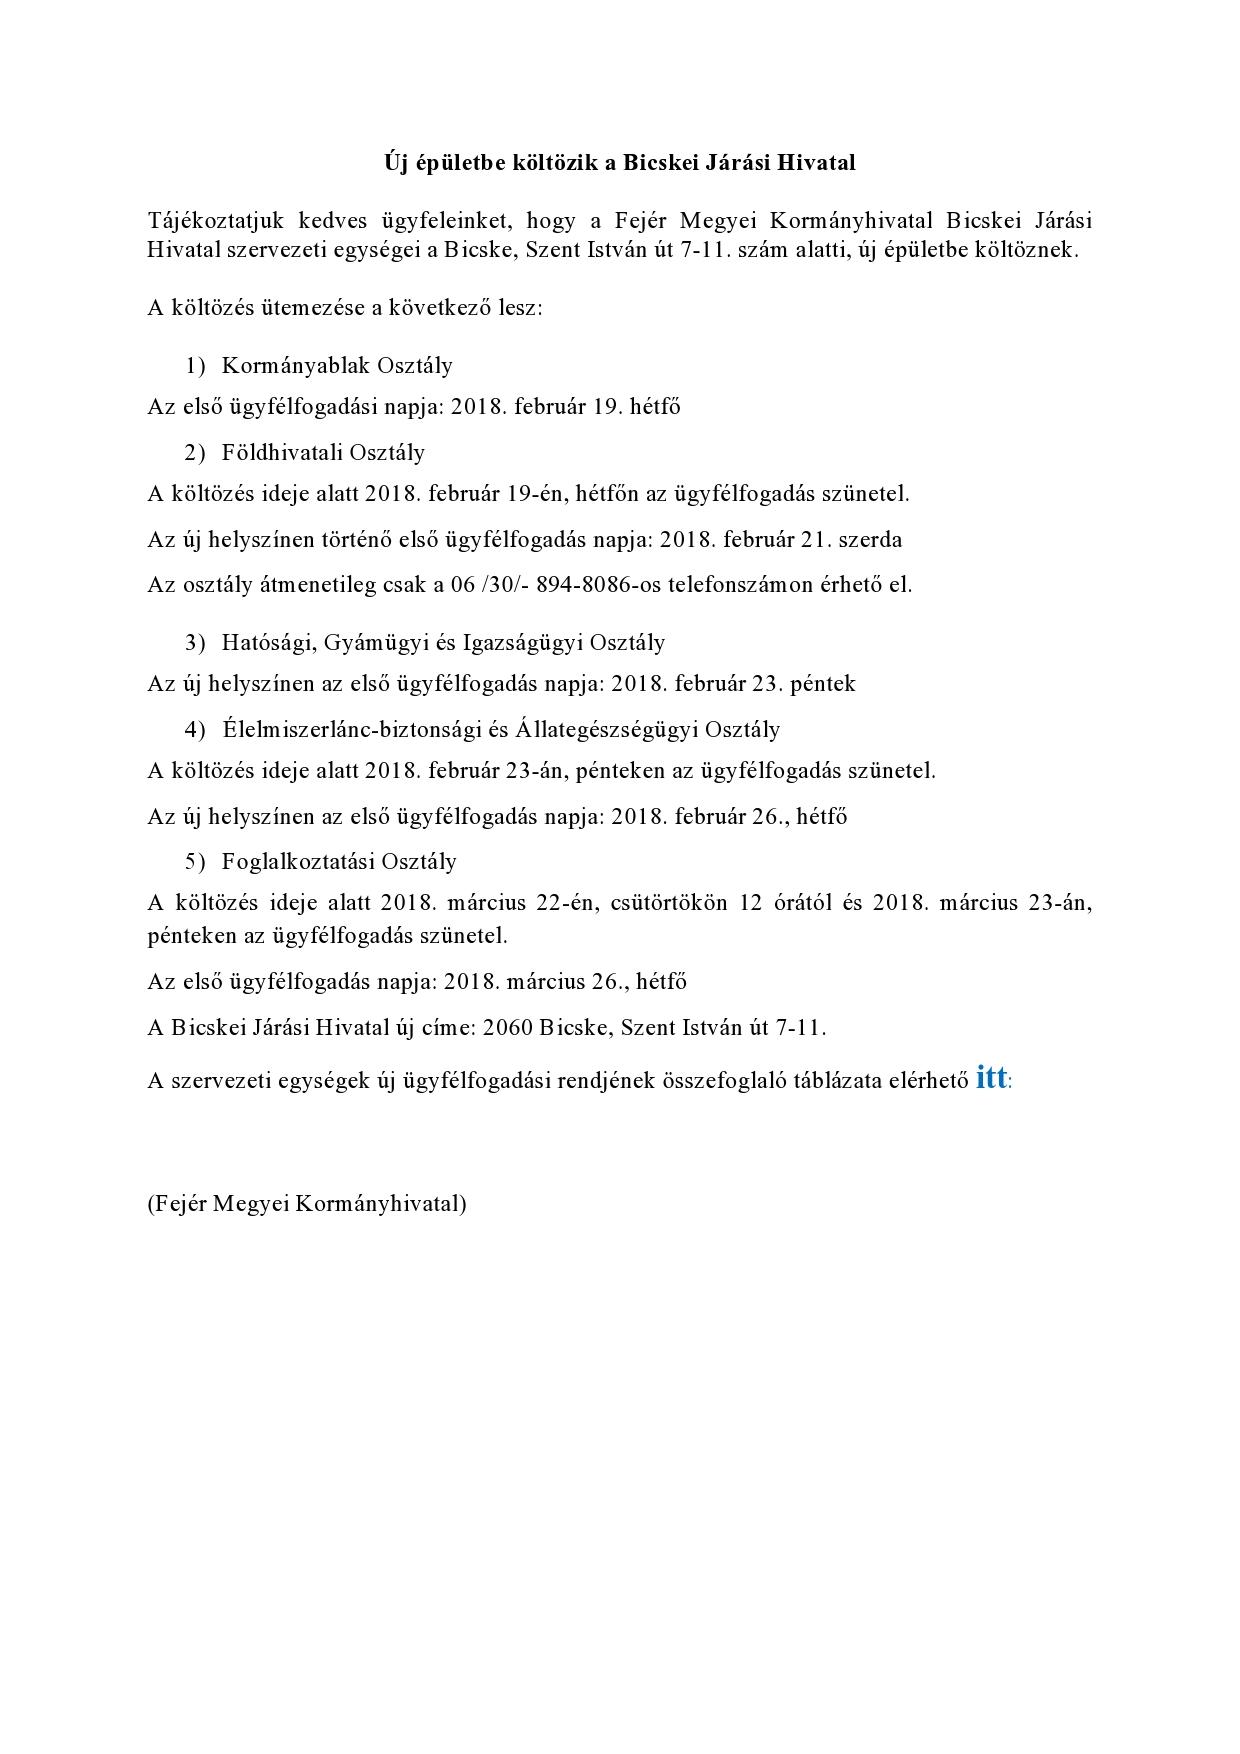 bicskei_jh_koltozes_20180213-page0001.jpg